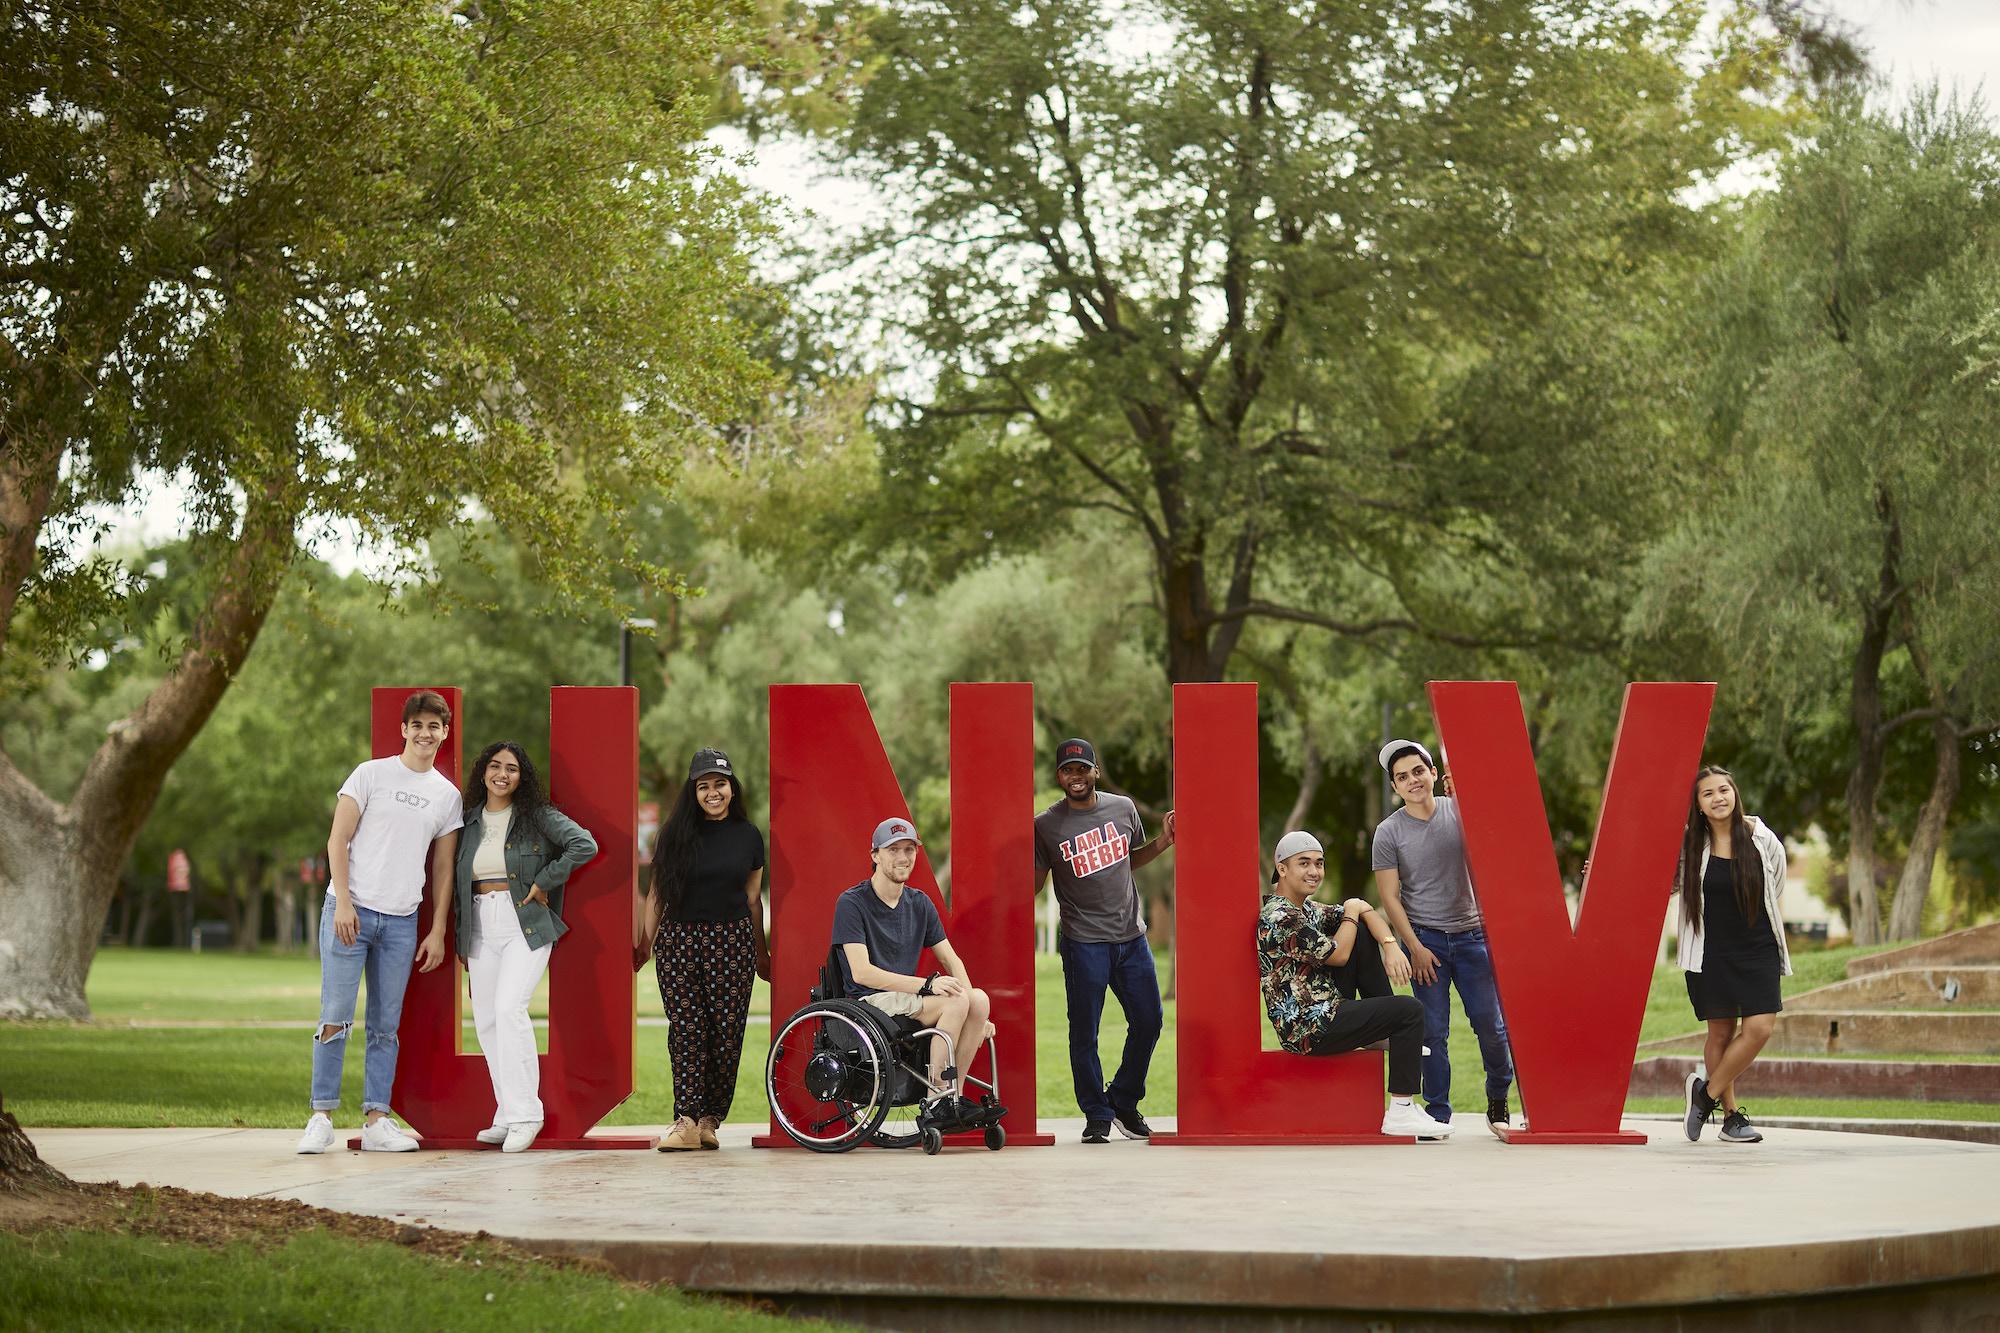 www.unlv.edu: U.S. News & World Report: UNLV Again Named Nation's Most Diverse Campus